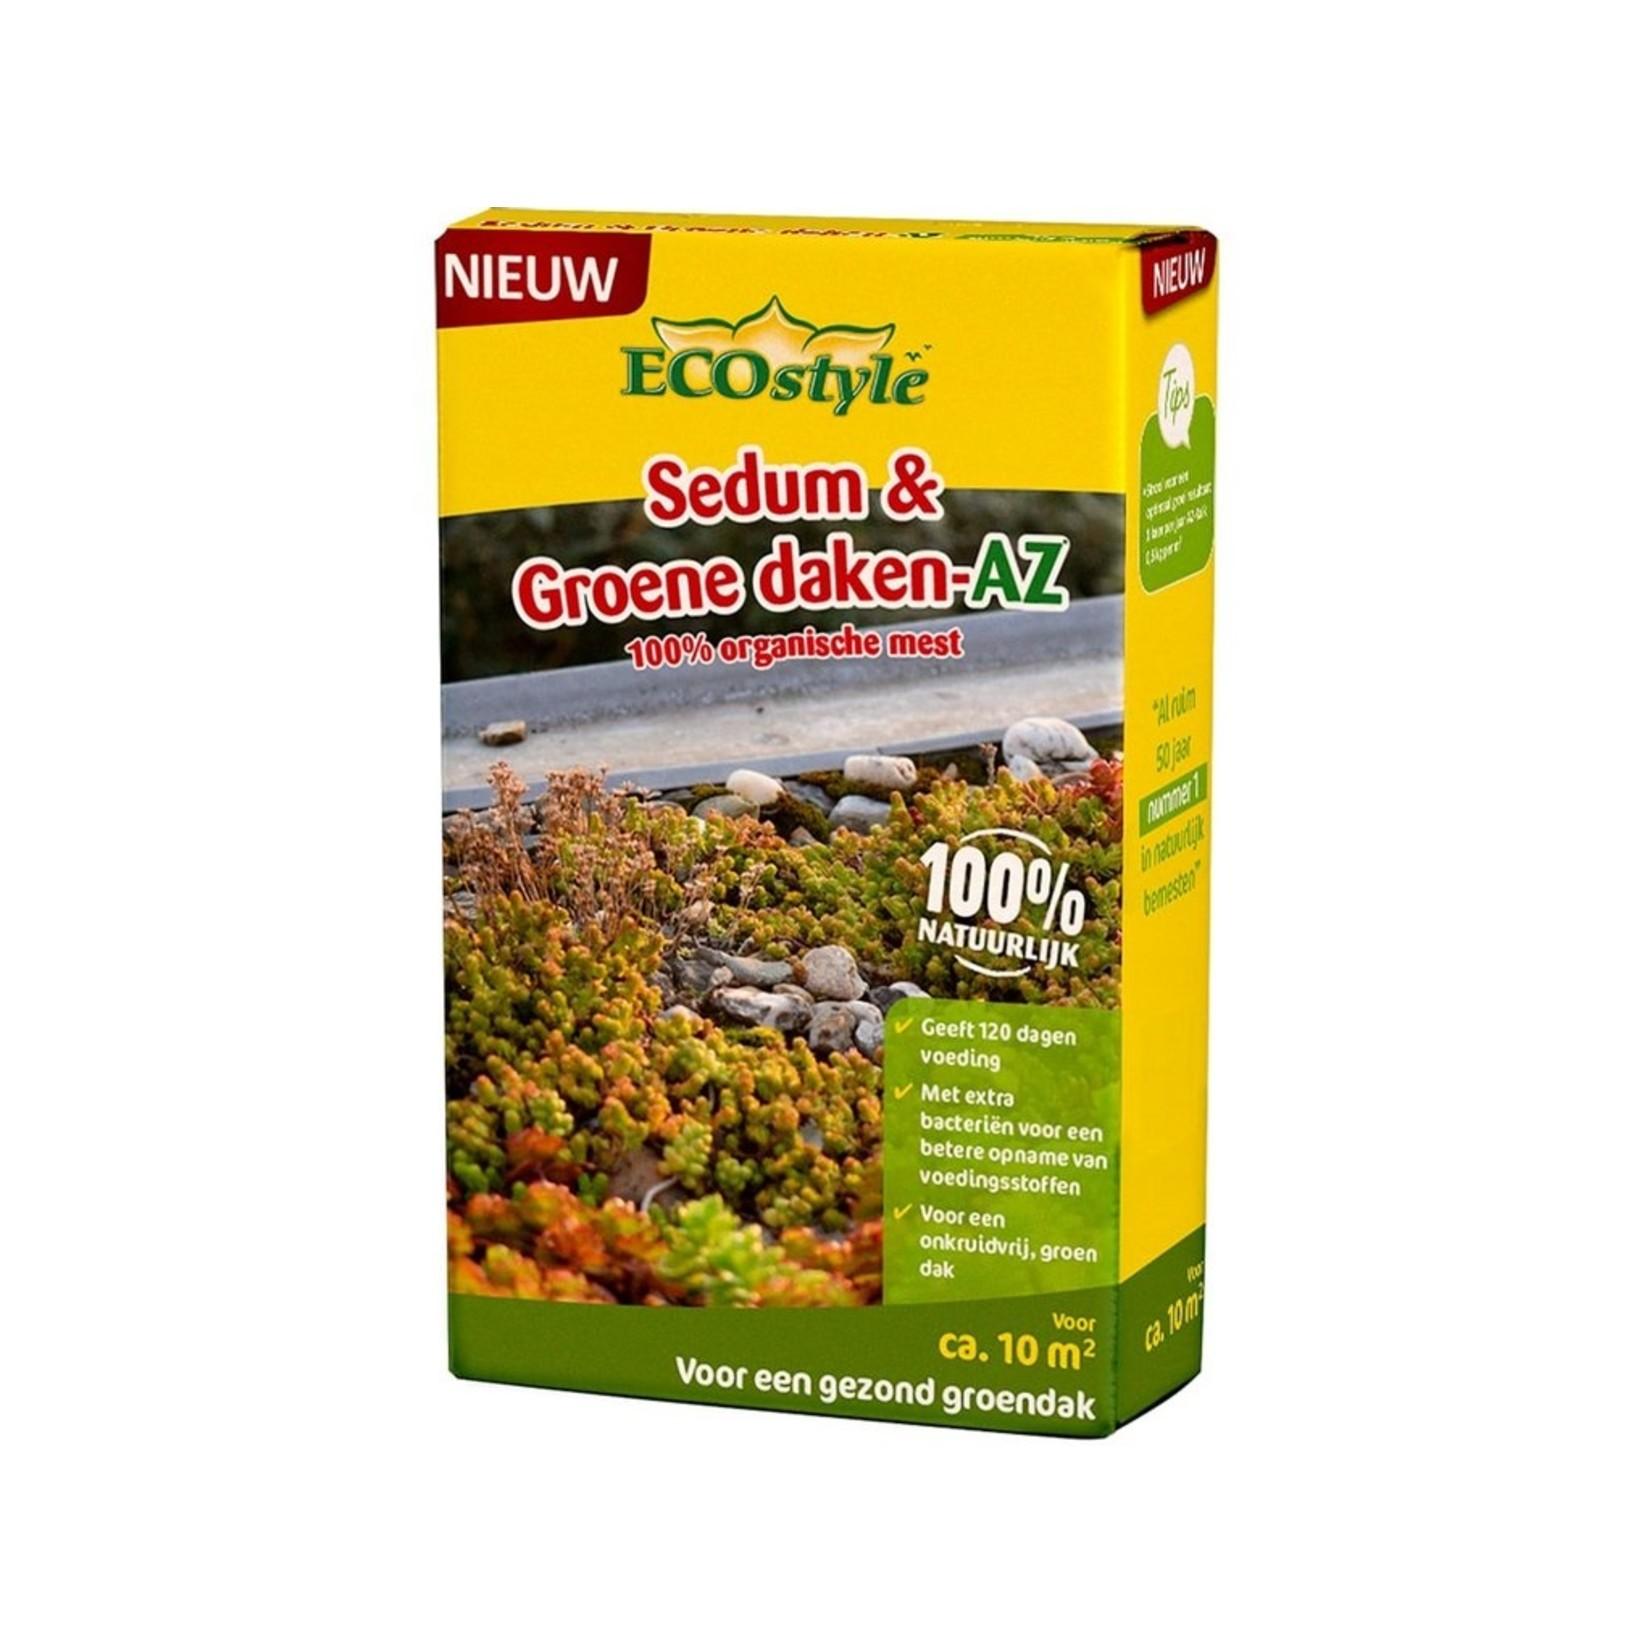 Ecostyle Sedum & Groene daken-AZ meststof 800 gram (10 m²)